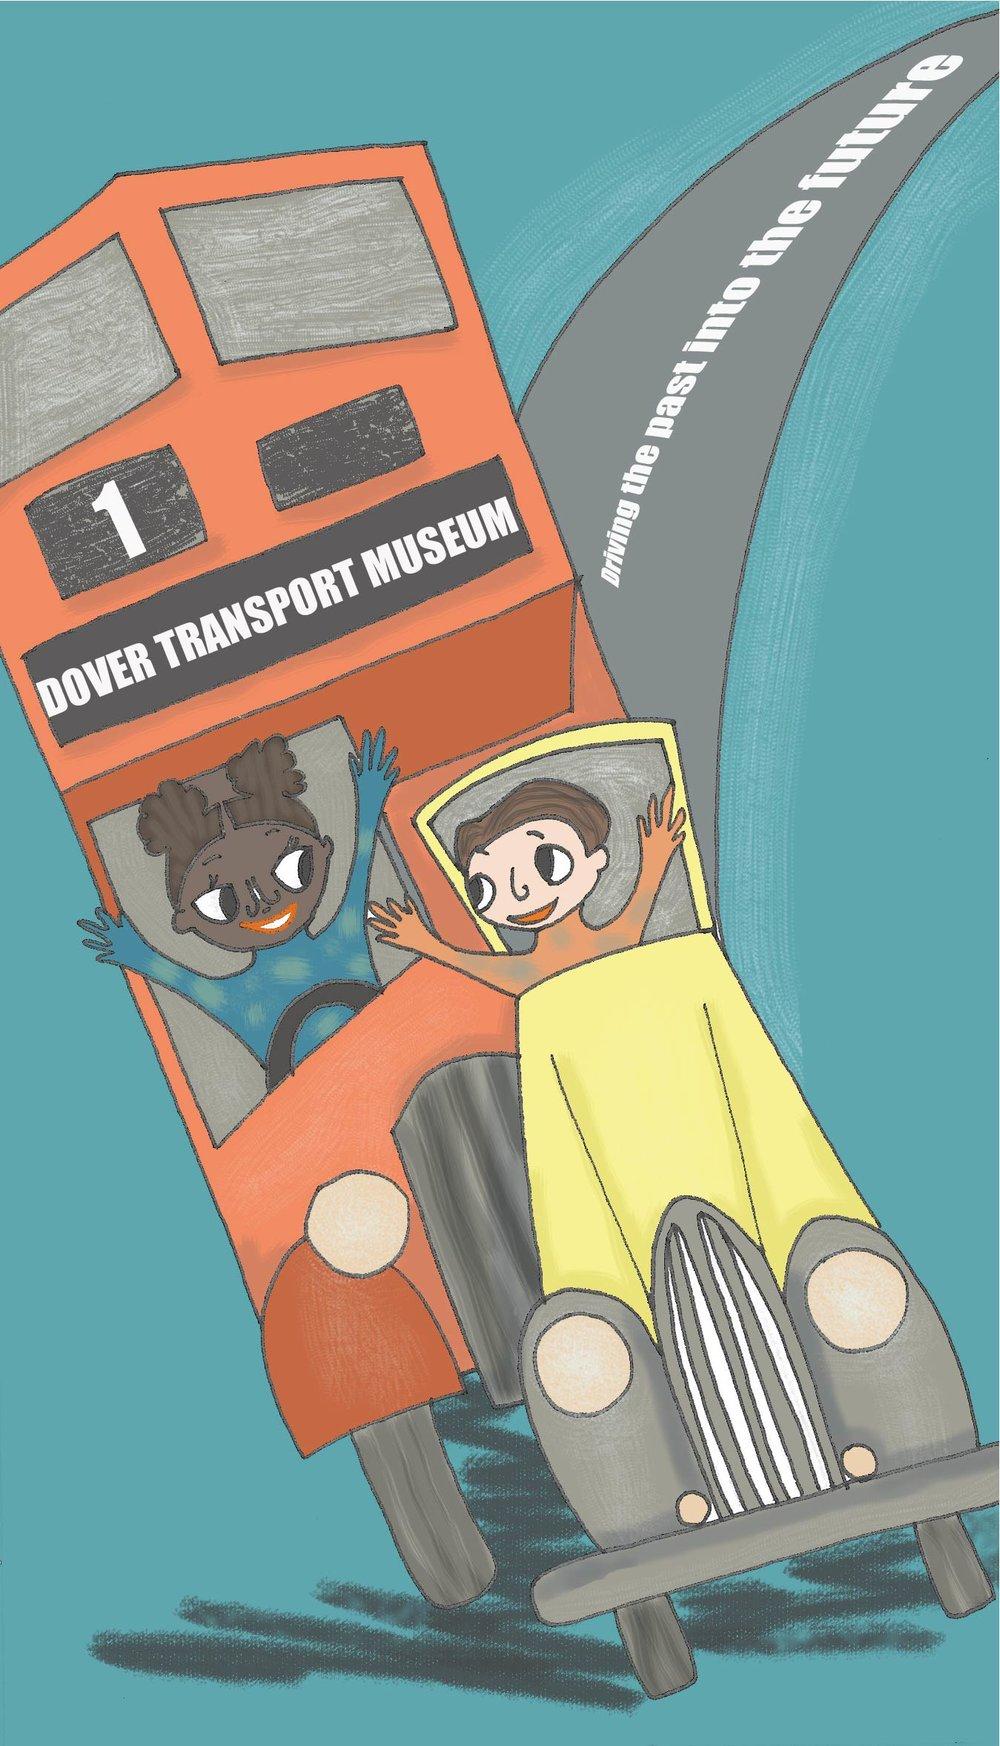 Transport poster kids visual 4-01.jpg